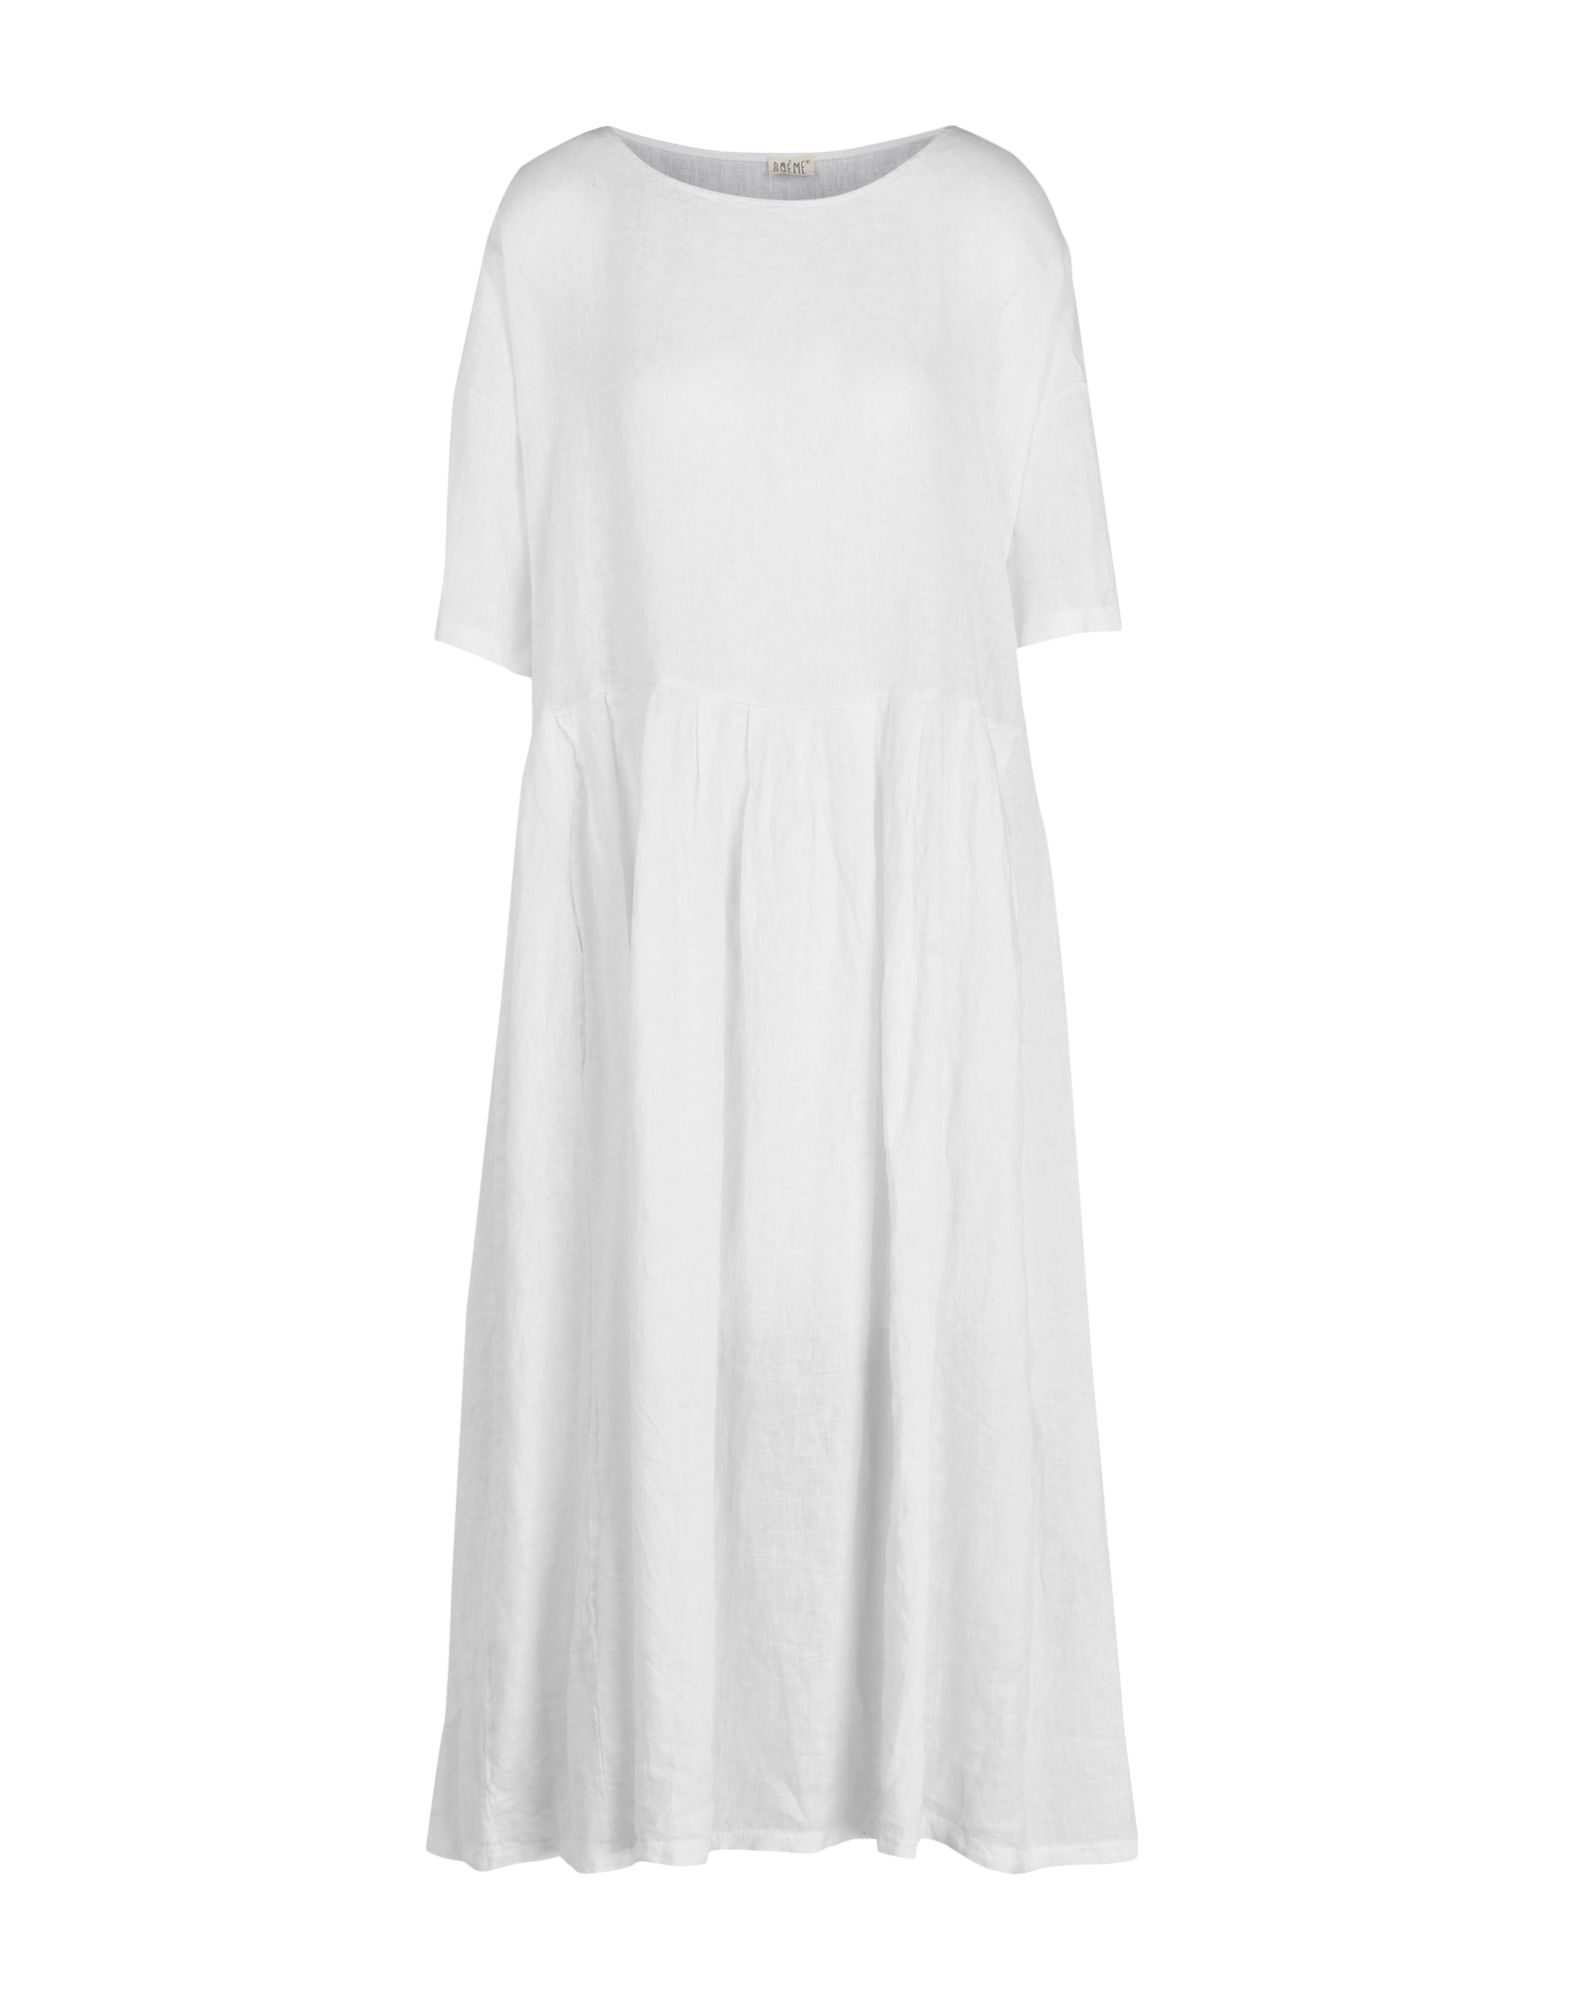 BOÈME® Платье длиной 3/4 lisa corti платье длиной 3 4